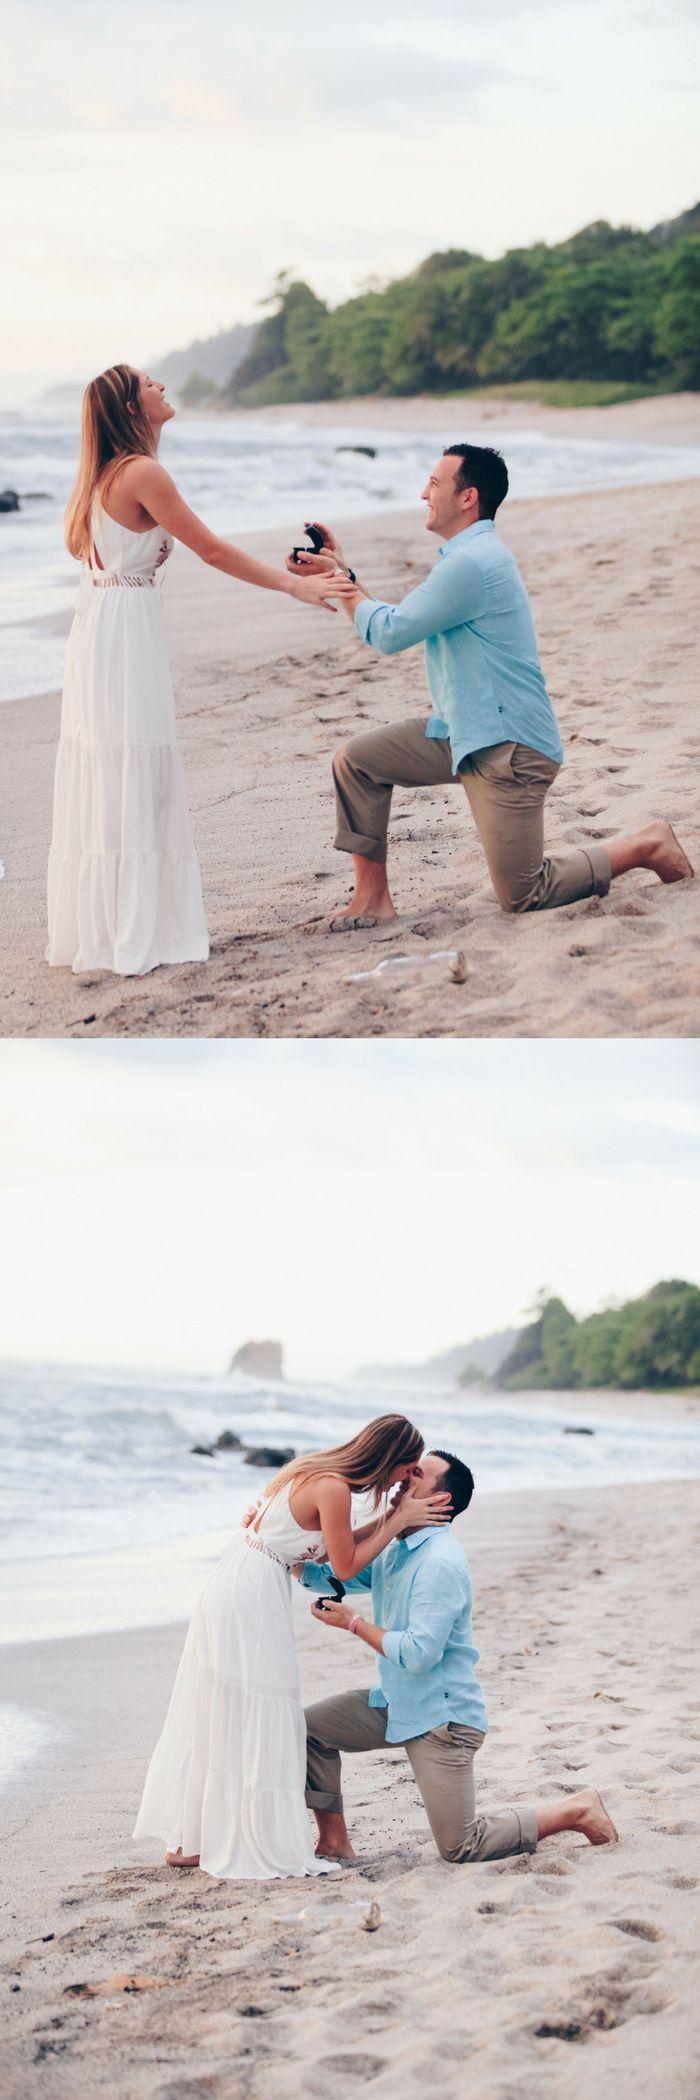 1713 best Perfect Proposals images on Pinterest | Proposals ...